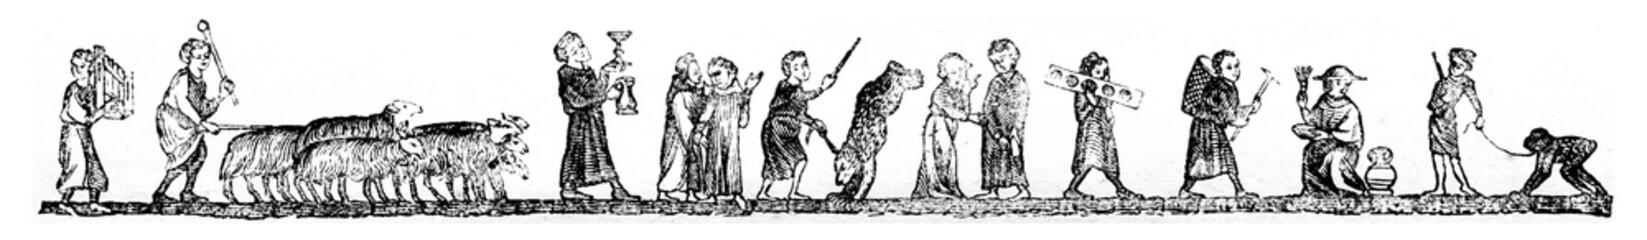 Menetrier, Shepherd, Shouter of wine, Juggler, Showing off her p